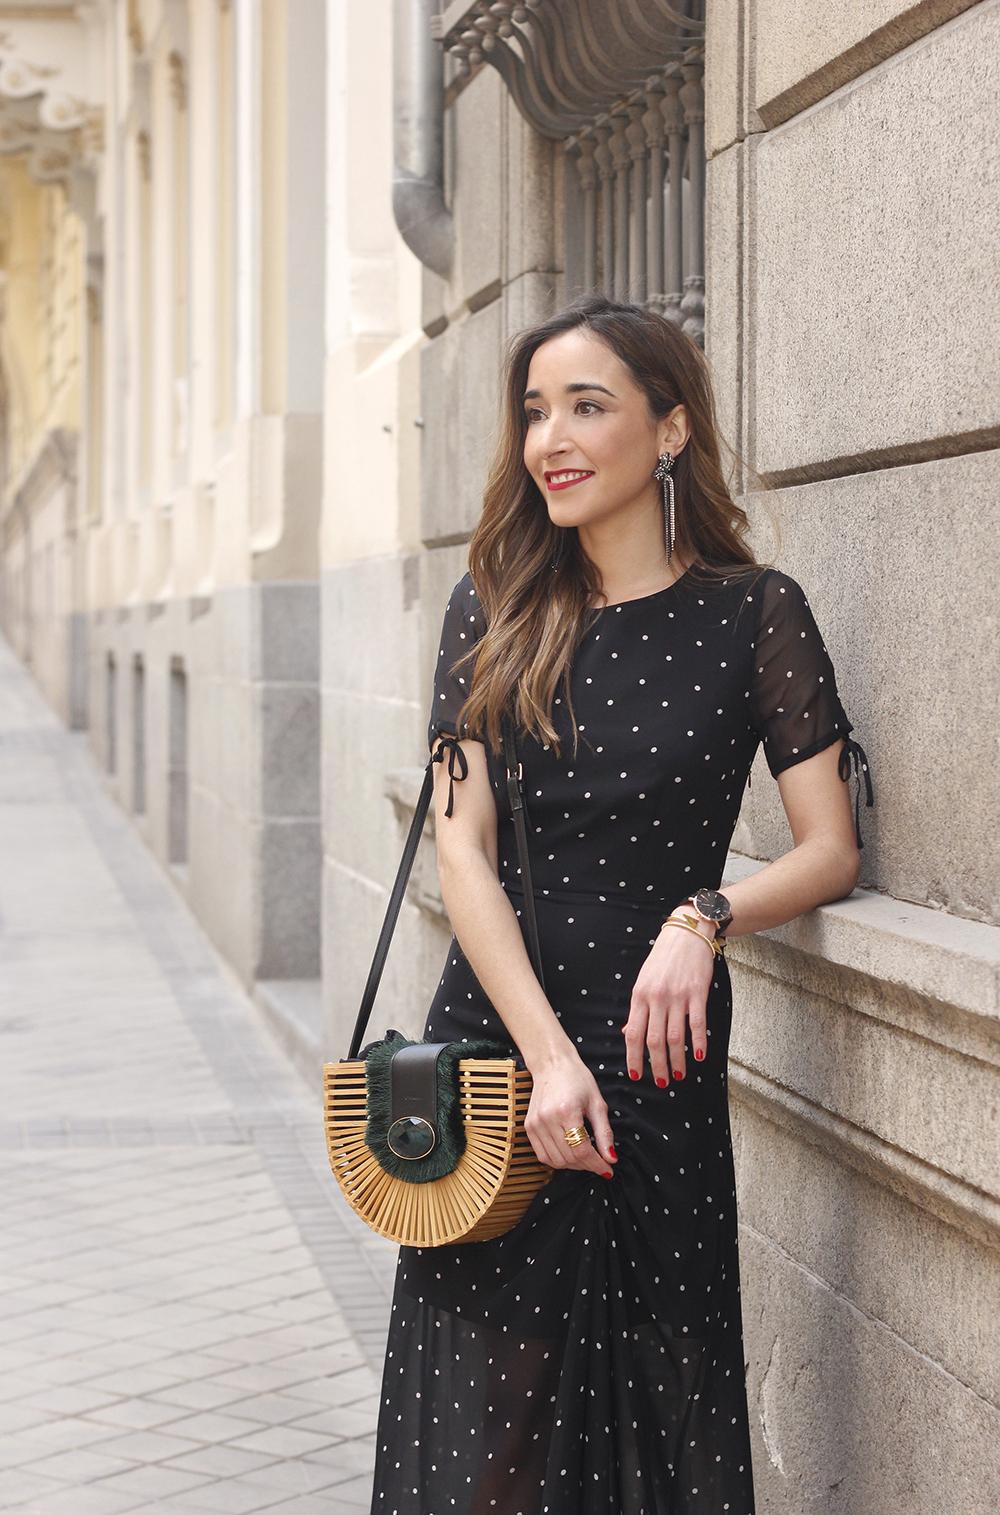 polka dot dress uterqüe jewel heels denim jacket outfit street style bamboo bag09